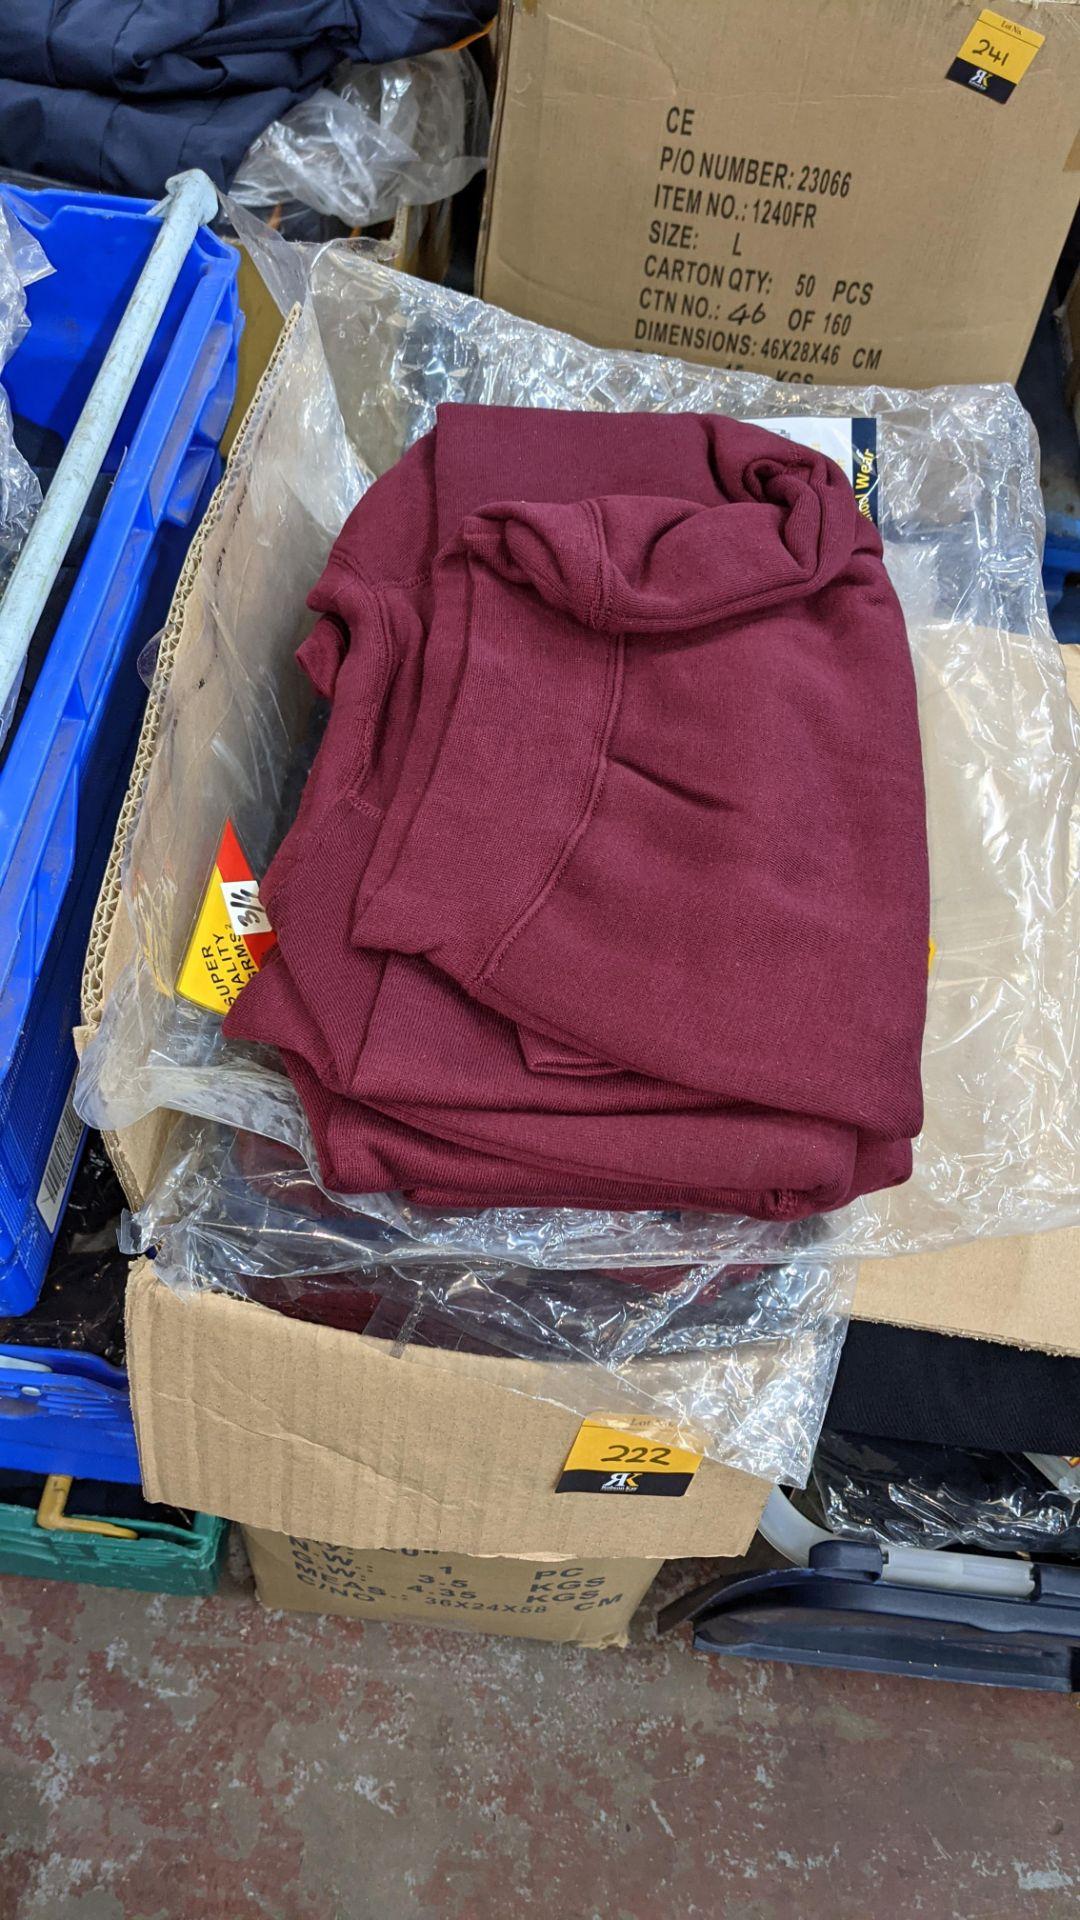 Approx 36 off children's burgundy sweatshirts - 1 large box - Image 2 of 4